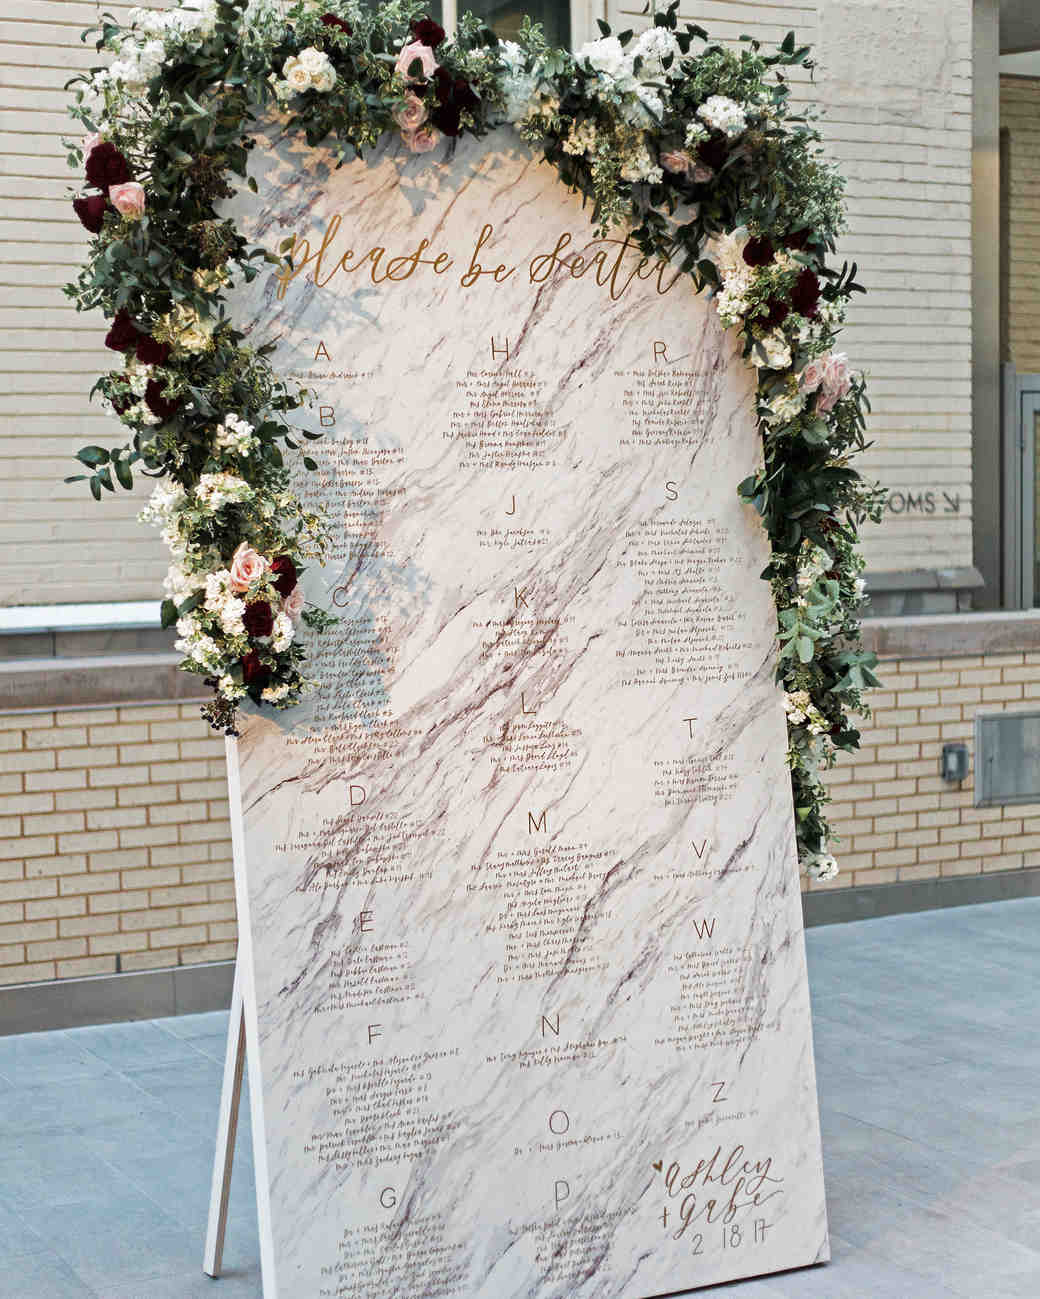 Wedding Ideas Vogue: 39 Elegant Marbled Wedding Ideas